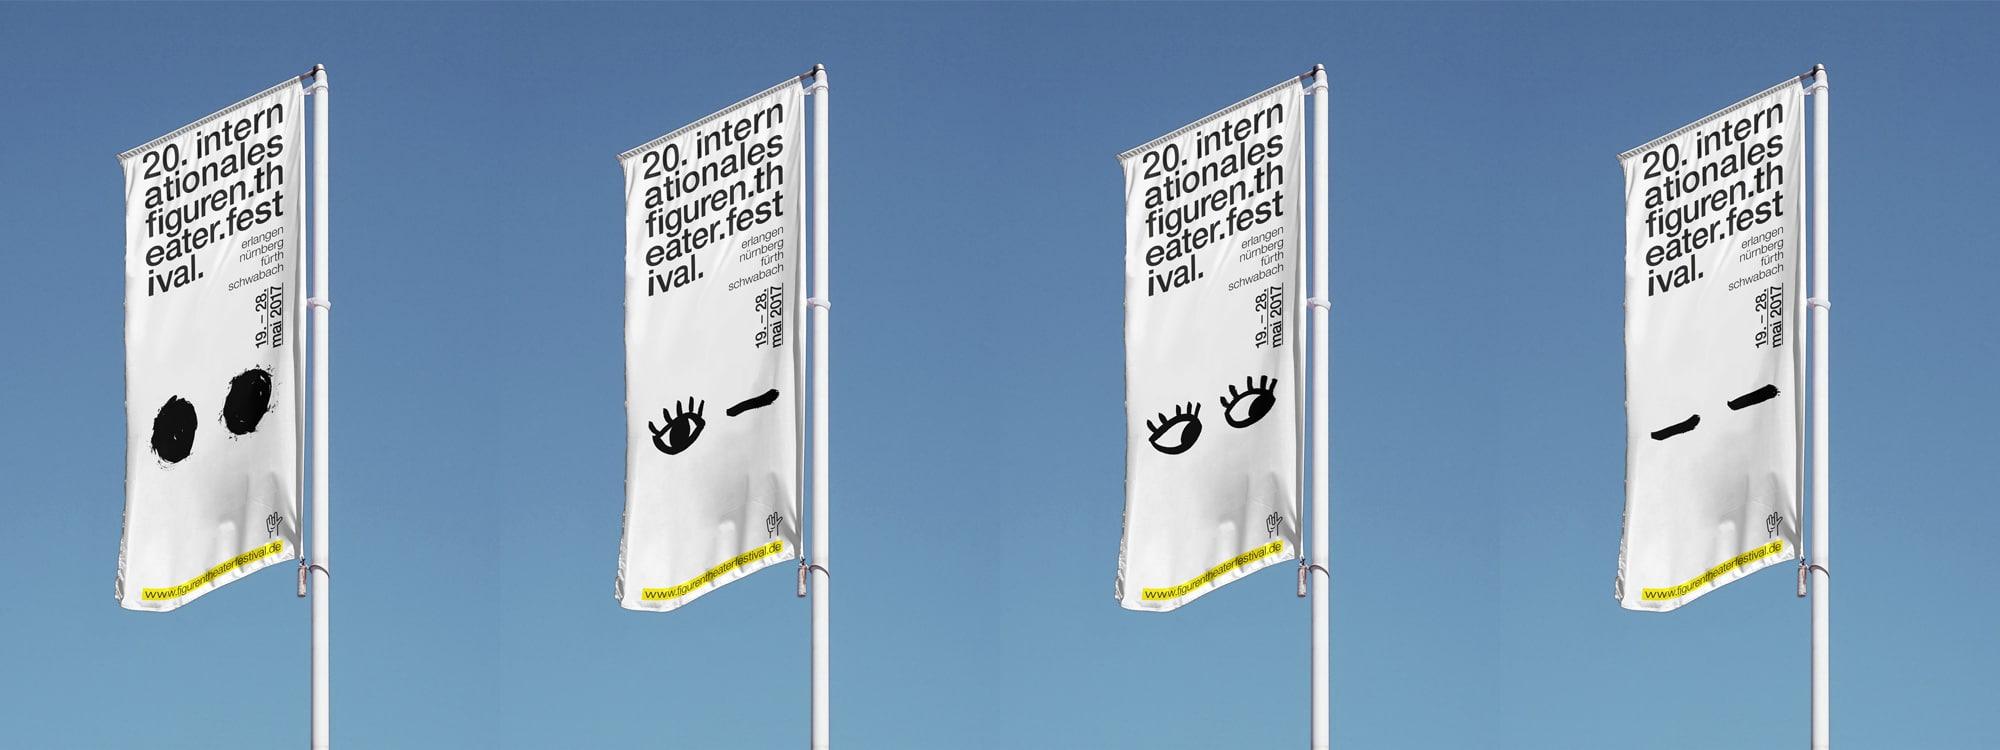 planx-internationales.figuren.theater.festival-hoch-flags